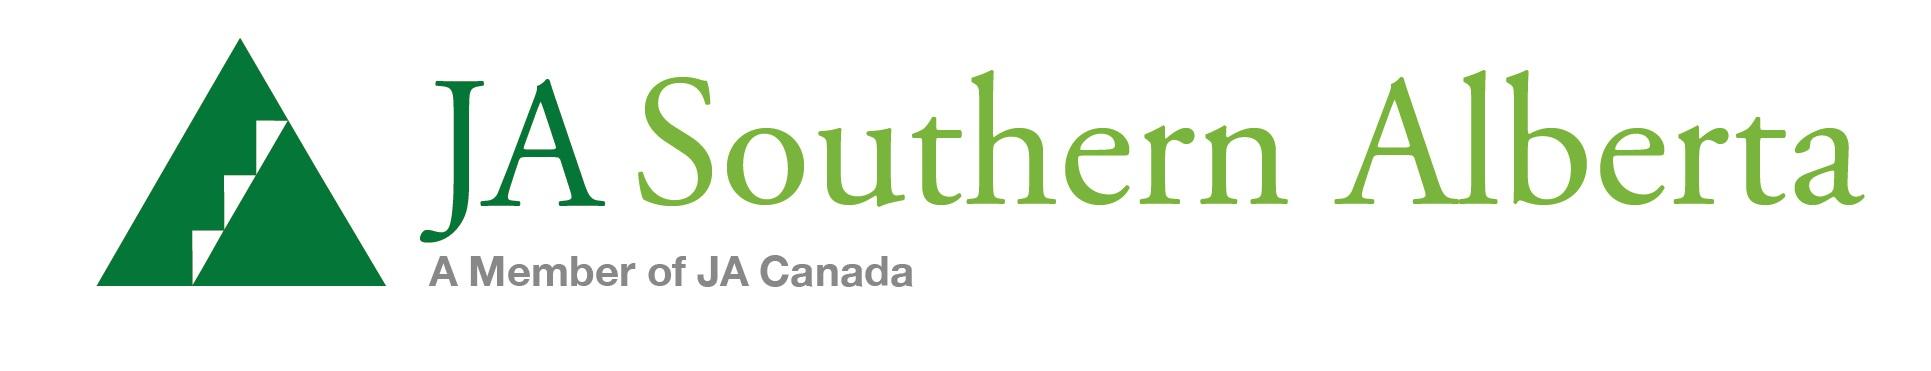 JA Southern Alberta_Primary_Preferred.jpg